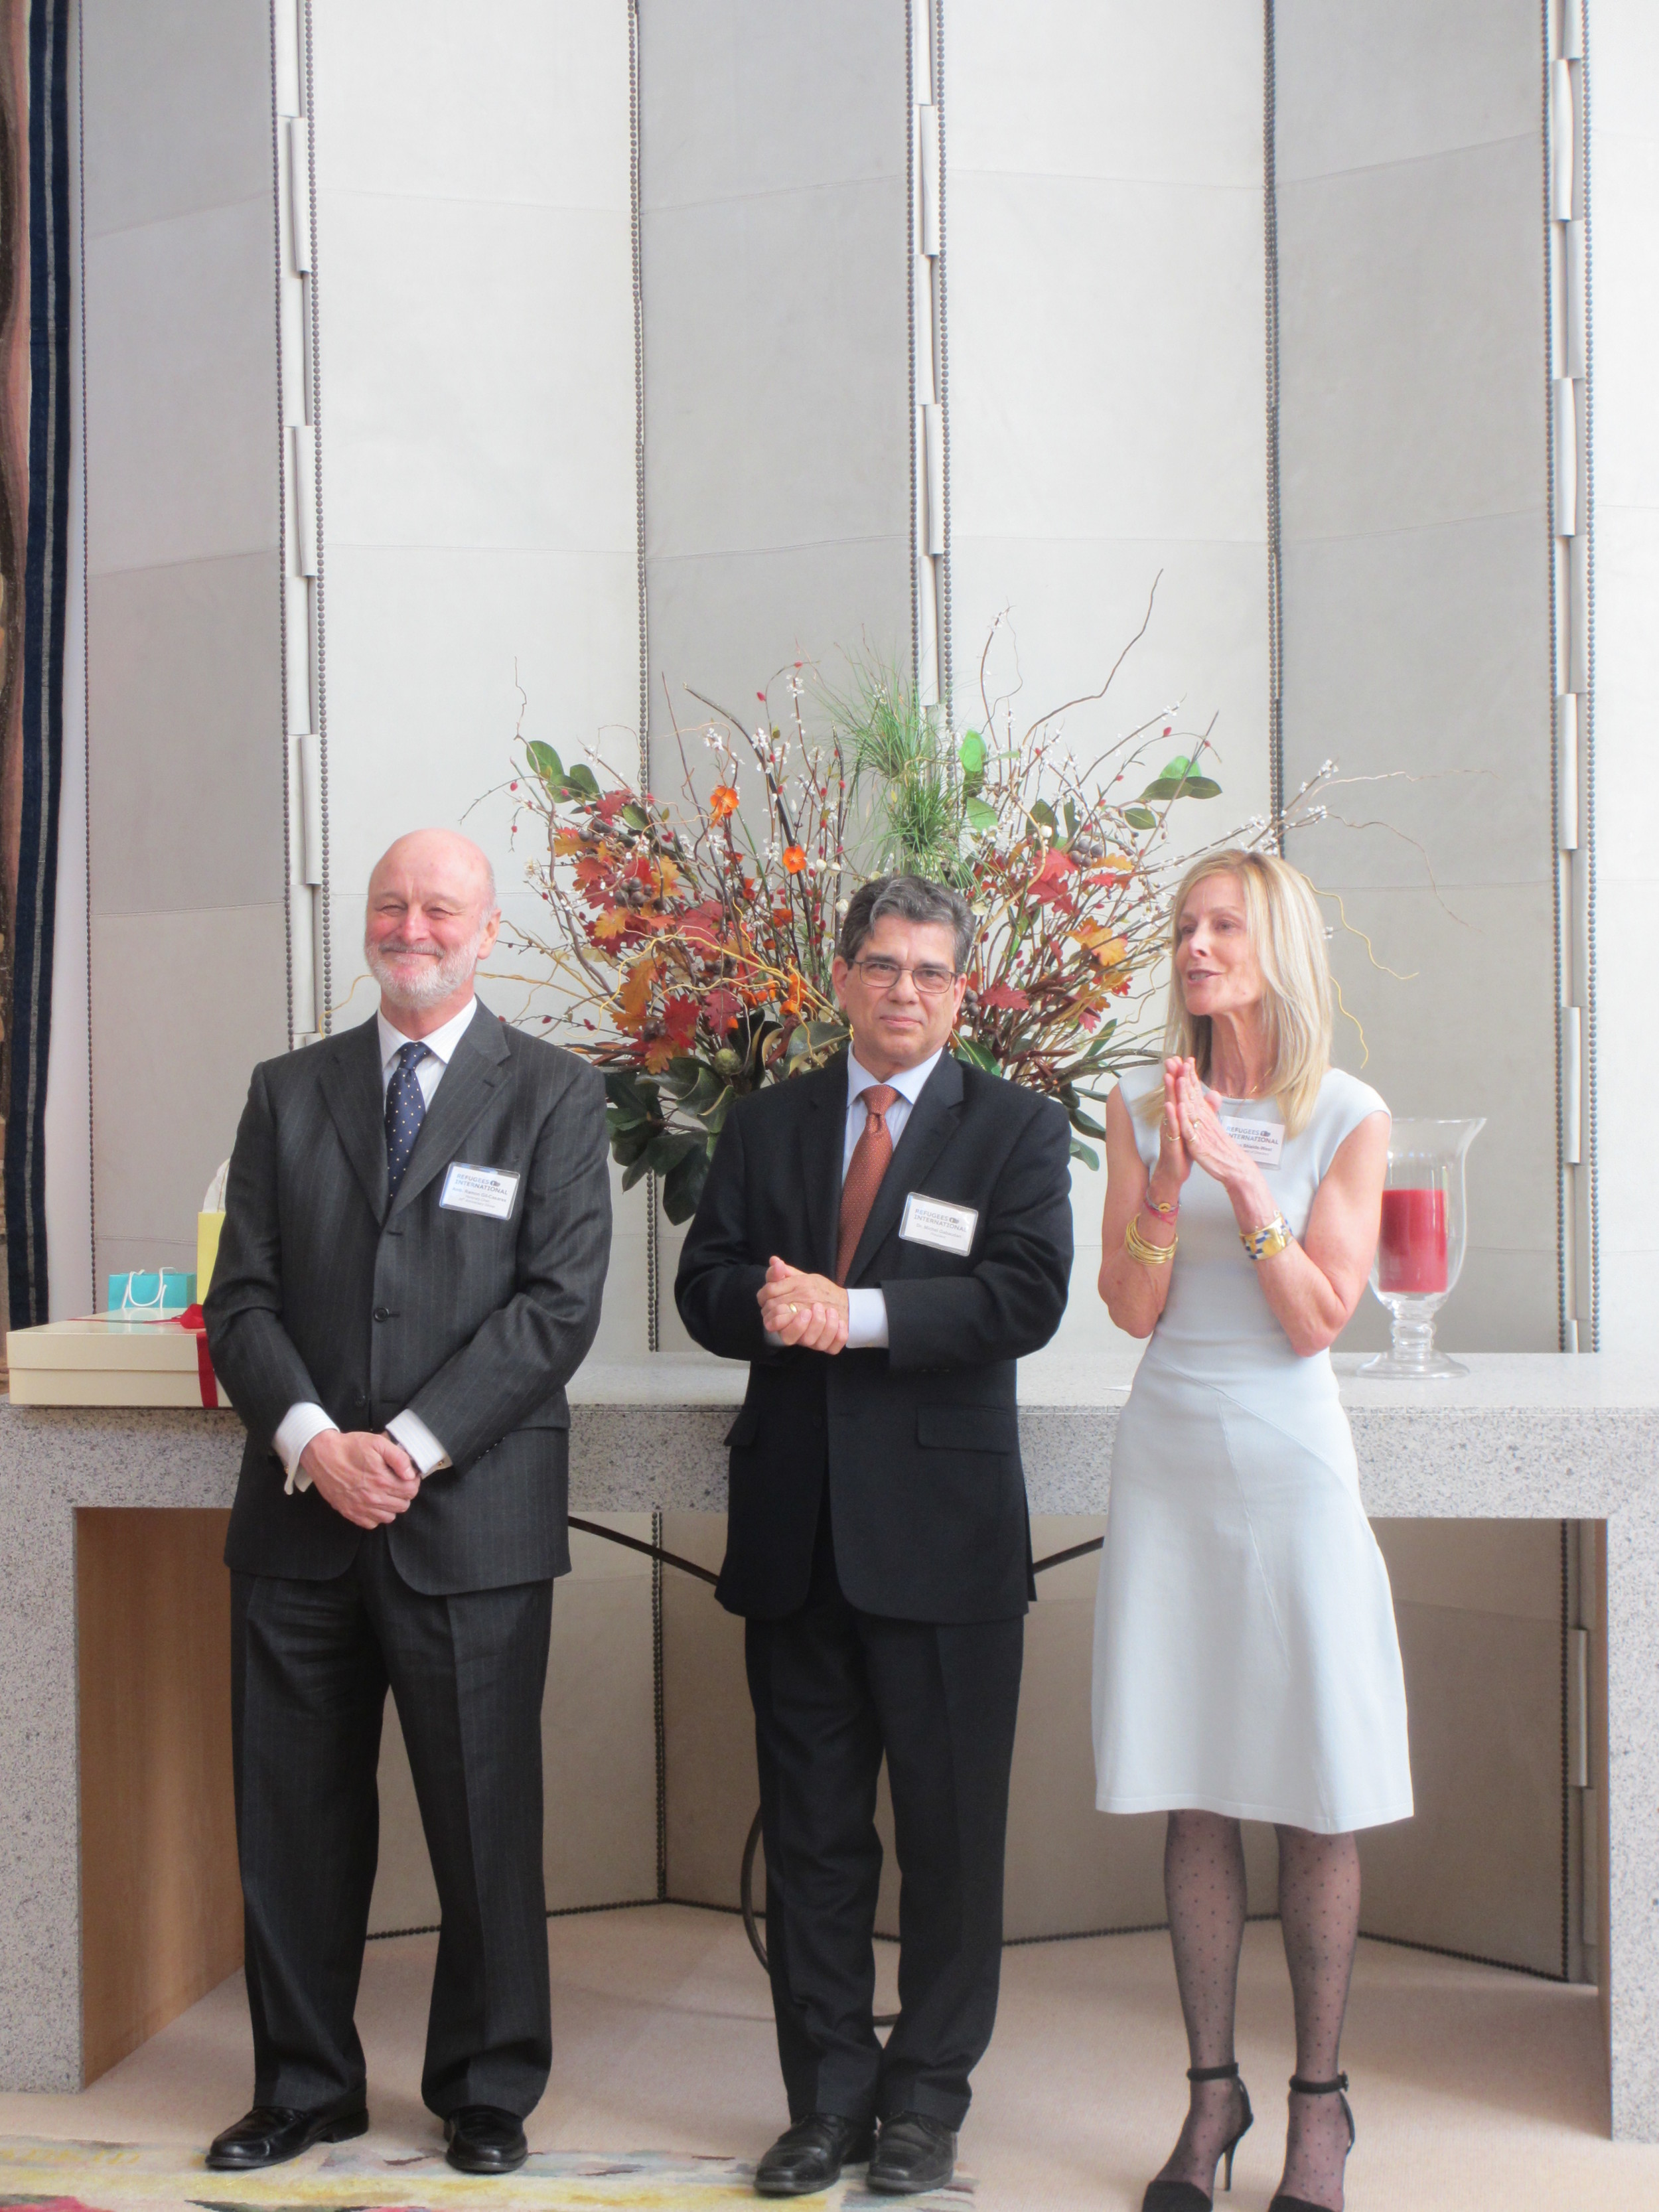 Ambassador Ramon Gil-Casares of Spain, Refugees International President Michel Gabaudan, and Chair of the Board Eileen Shields-West